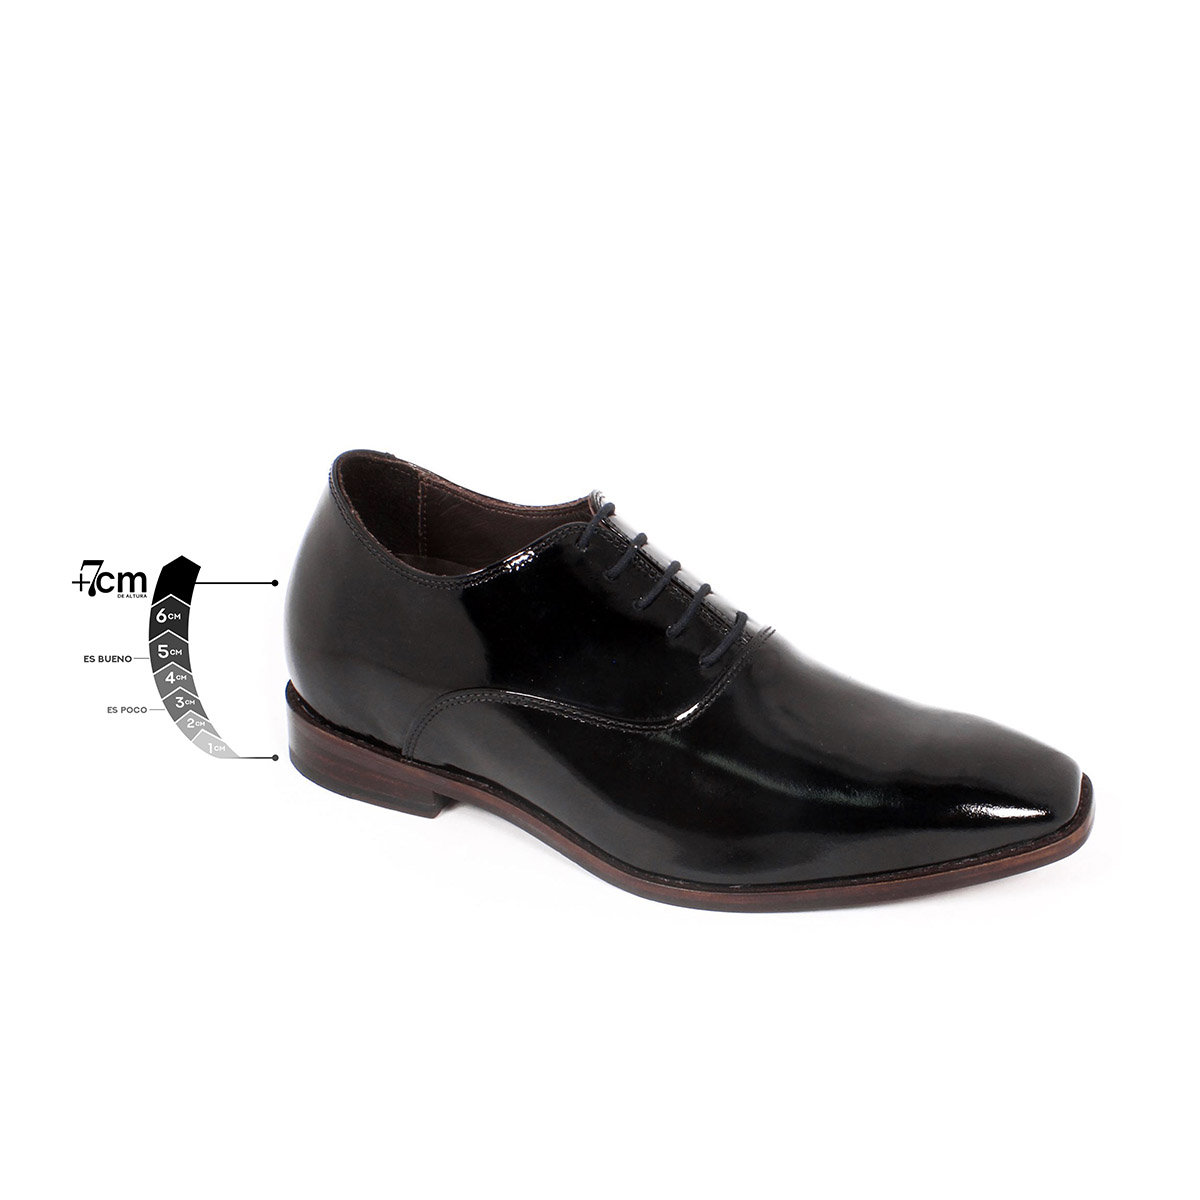 Zapato Formal Elegant Charol Negro Max Denegri +7cms de Altura_75310